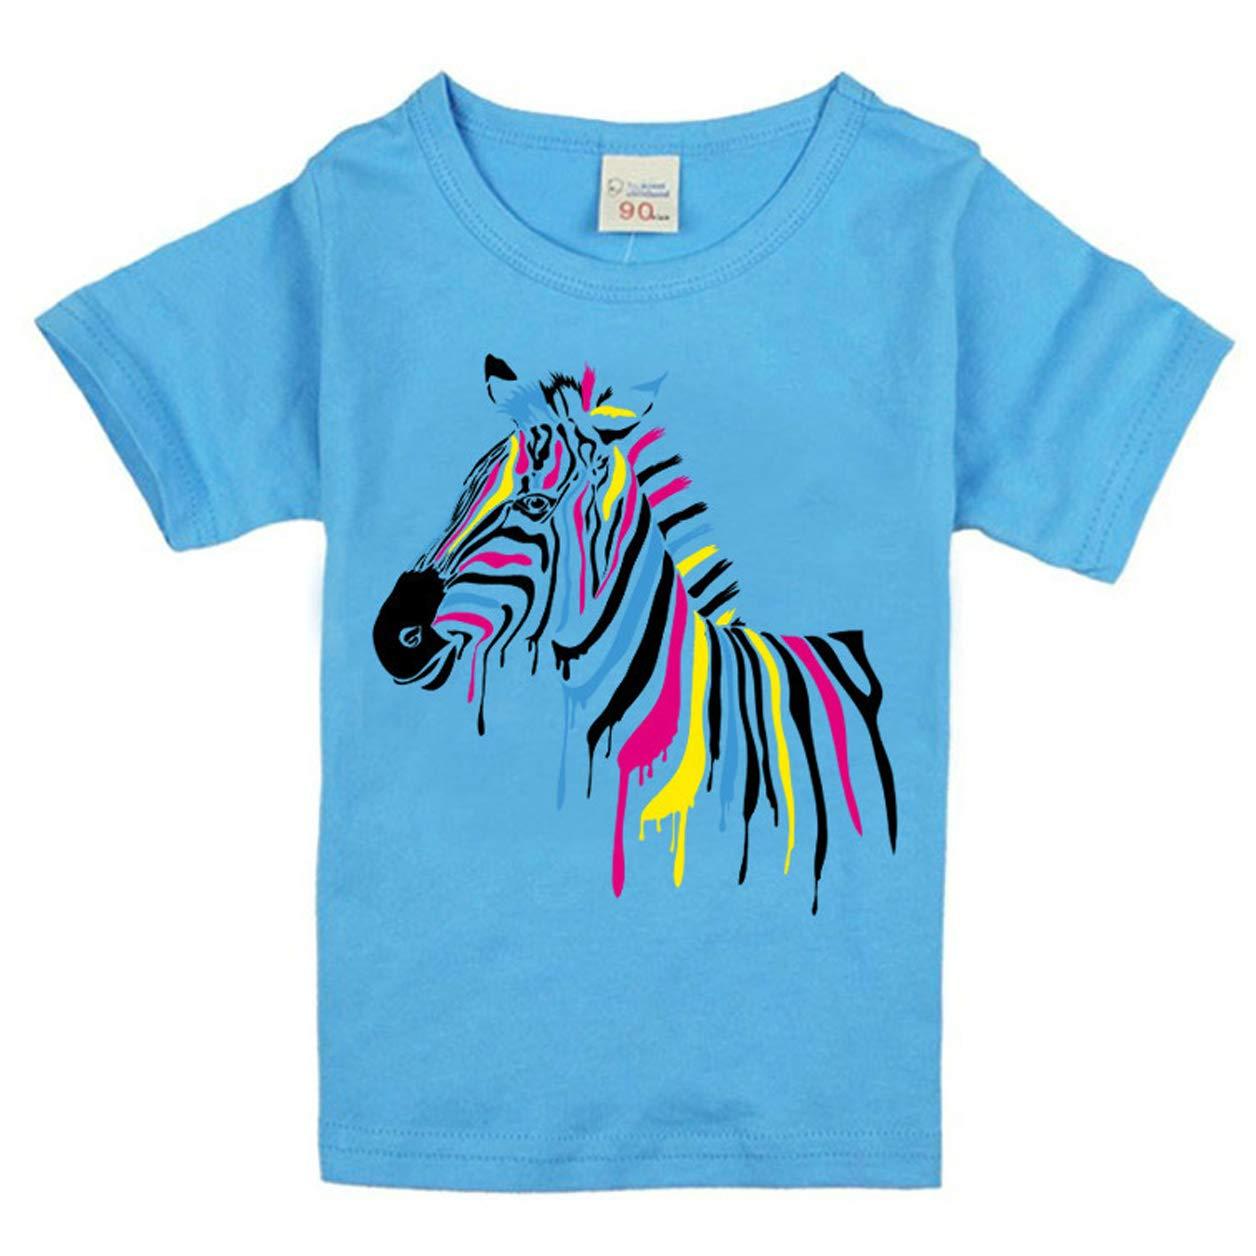 Zebra Childrens T-Shirts 100/% Cotton Summer Short Sleeved Round Neck Unisex T-Shirt 2-14 Years Old